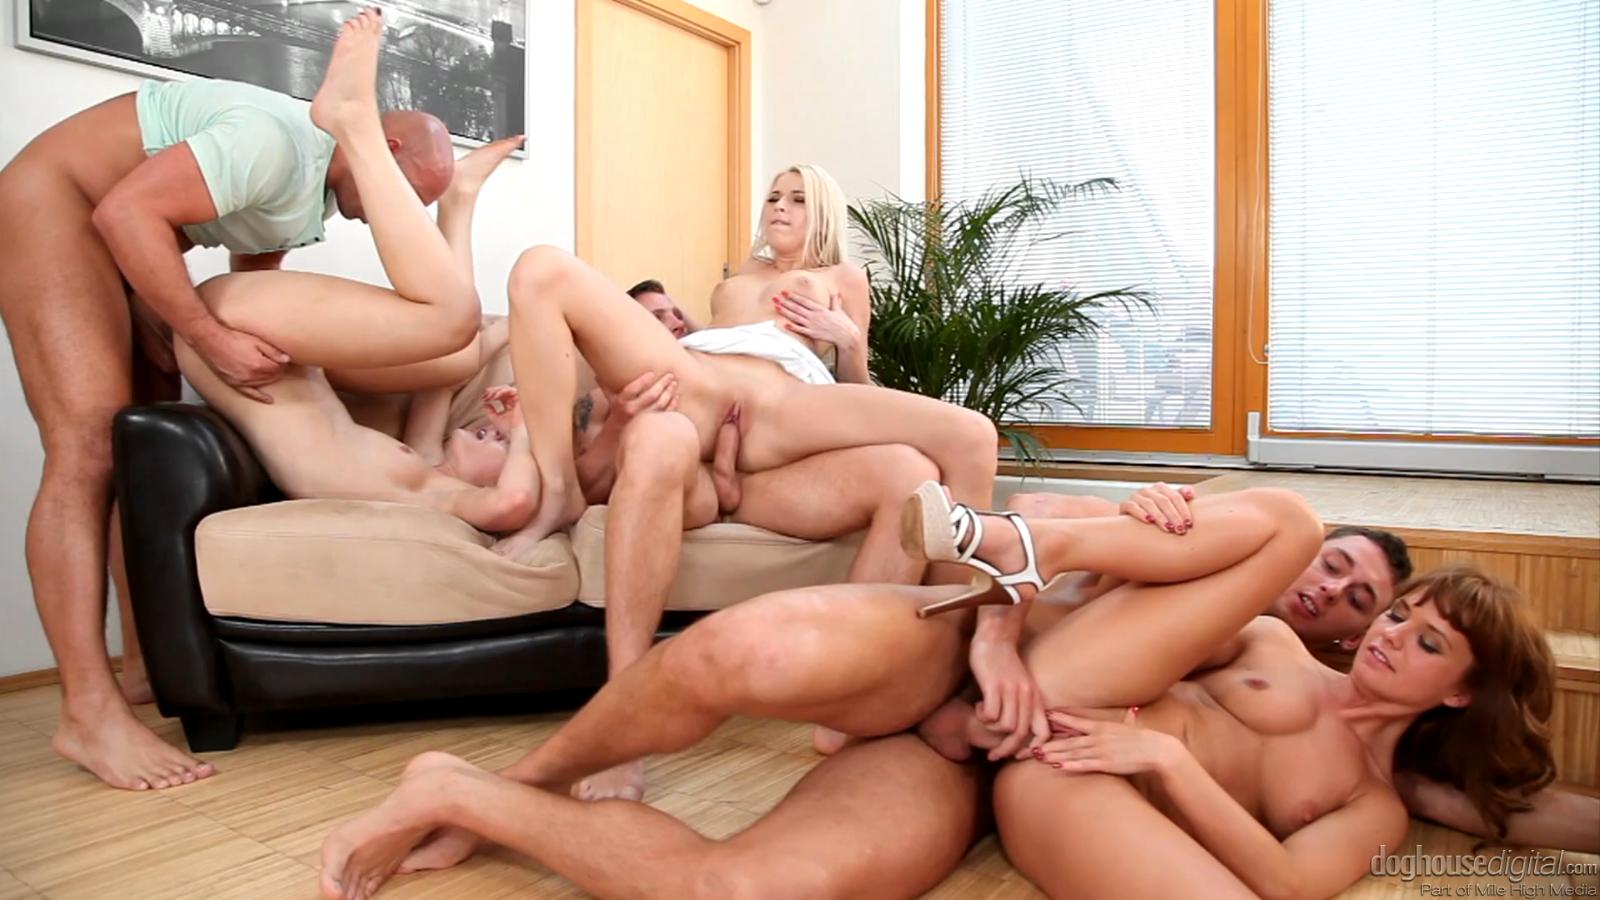 Bachelor party sex orgy pics